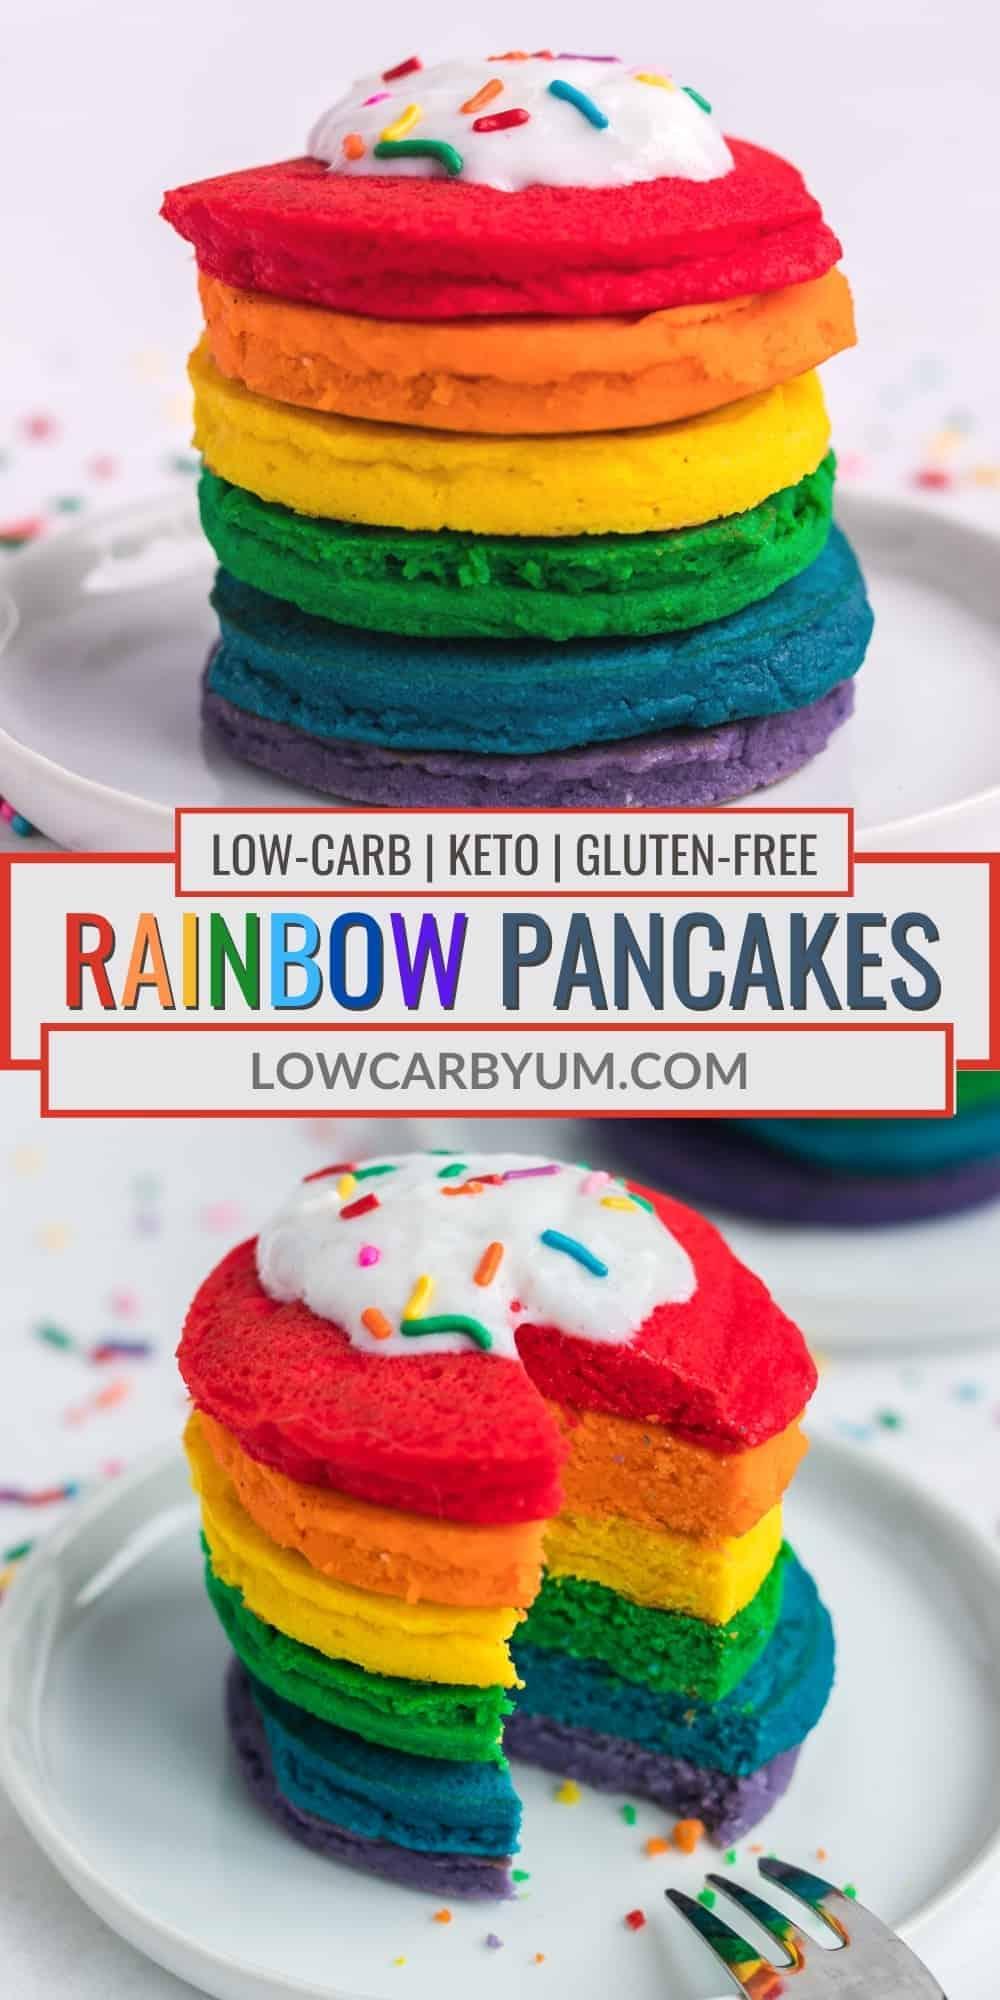 rainbow pancakes pinterest image